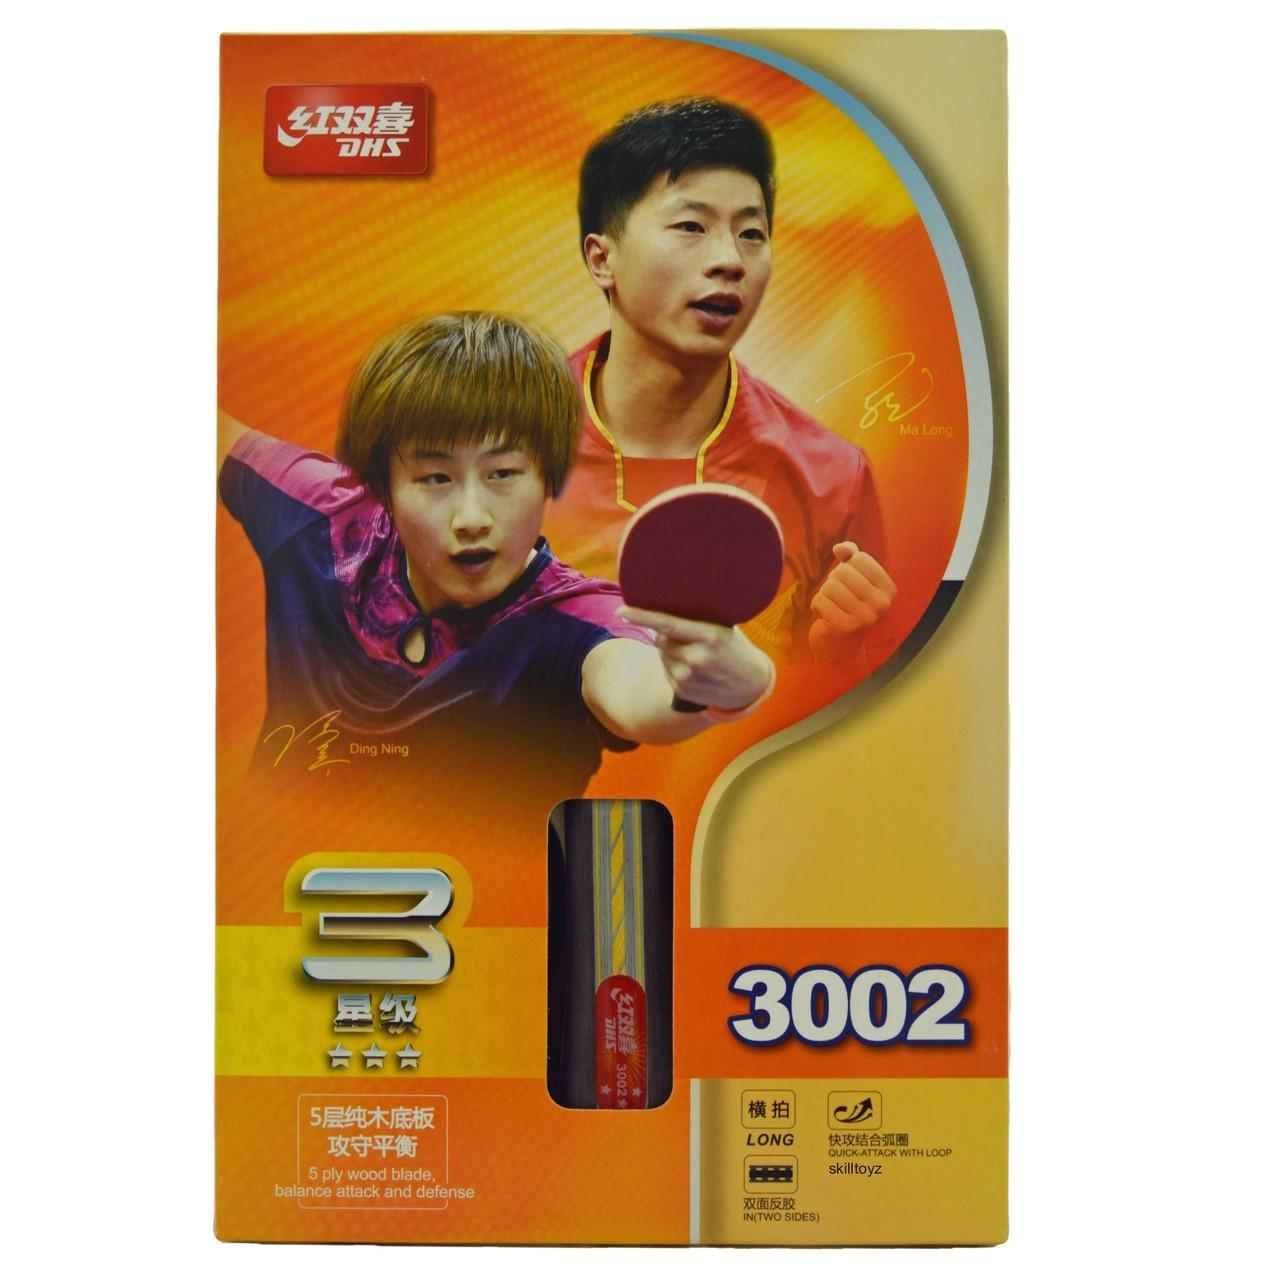 Excellent Dhs 3 Star Table Tennis Bat R3002 Free Rubber Protectors Interior Design Ideas Oteneahmetsinanyavuzinfo